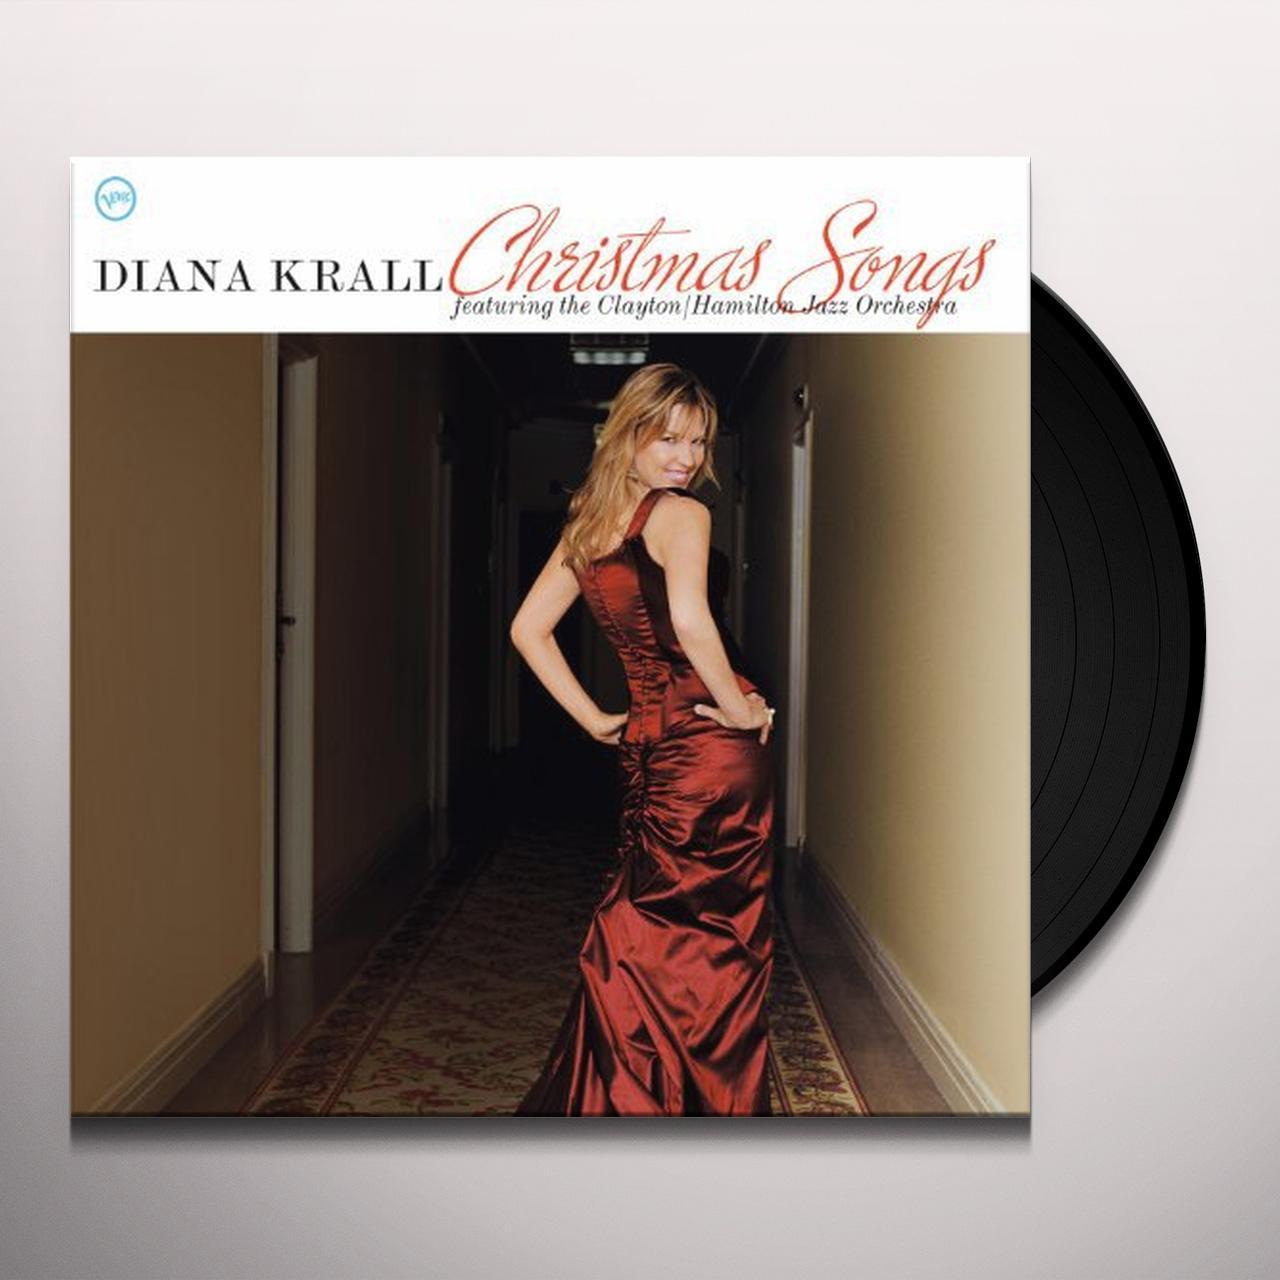 diana krall christmas songs vinyl record tap to expand - Diana Krall Christmas Songs